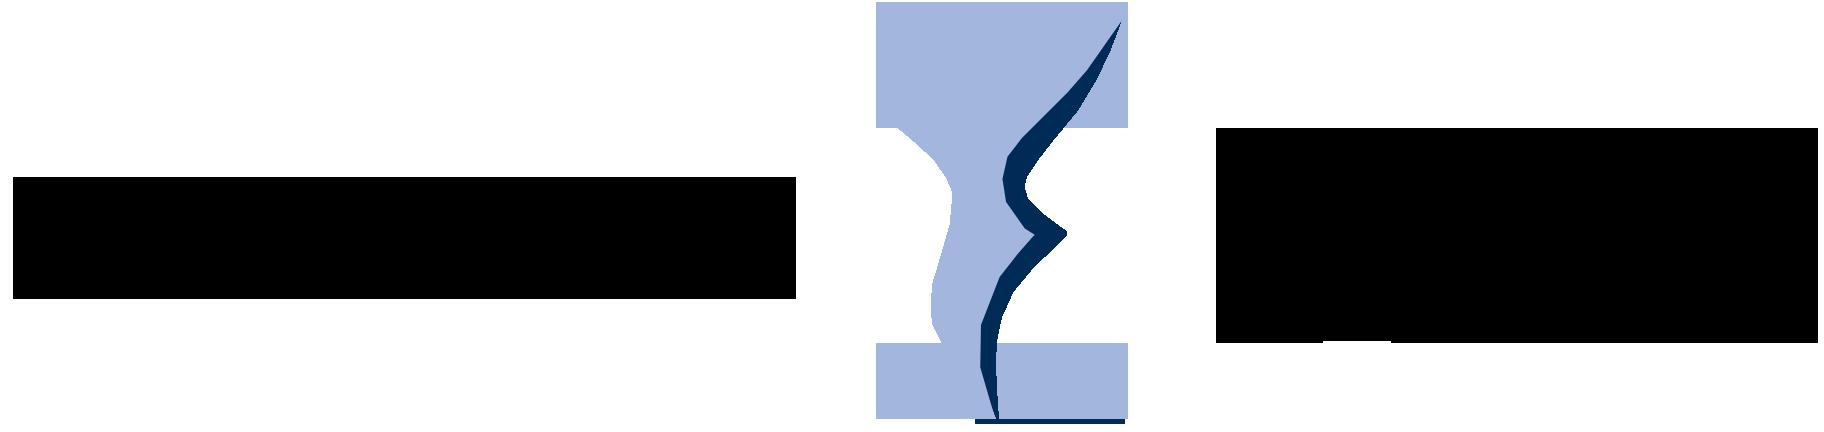 funvaped logo